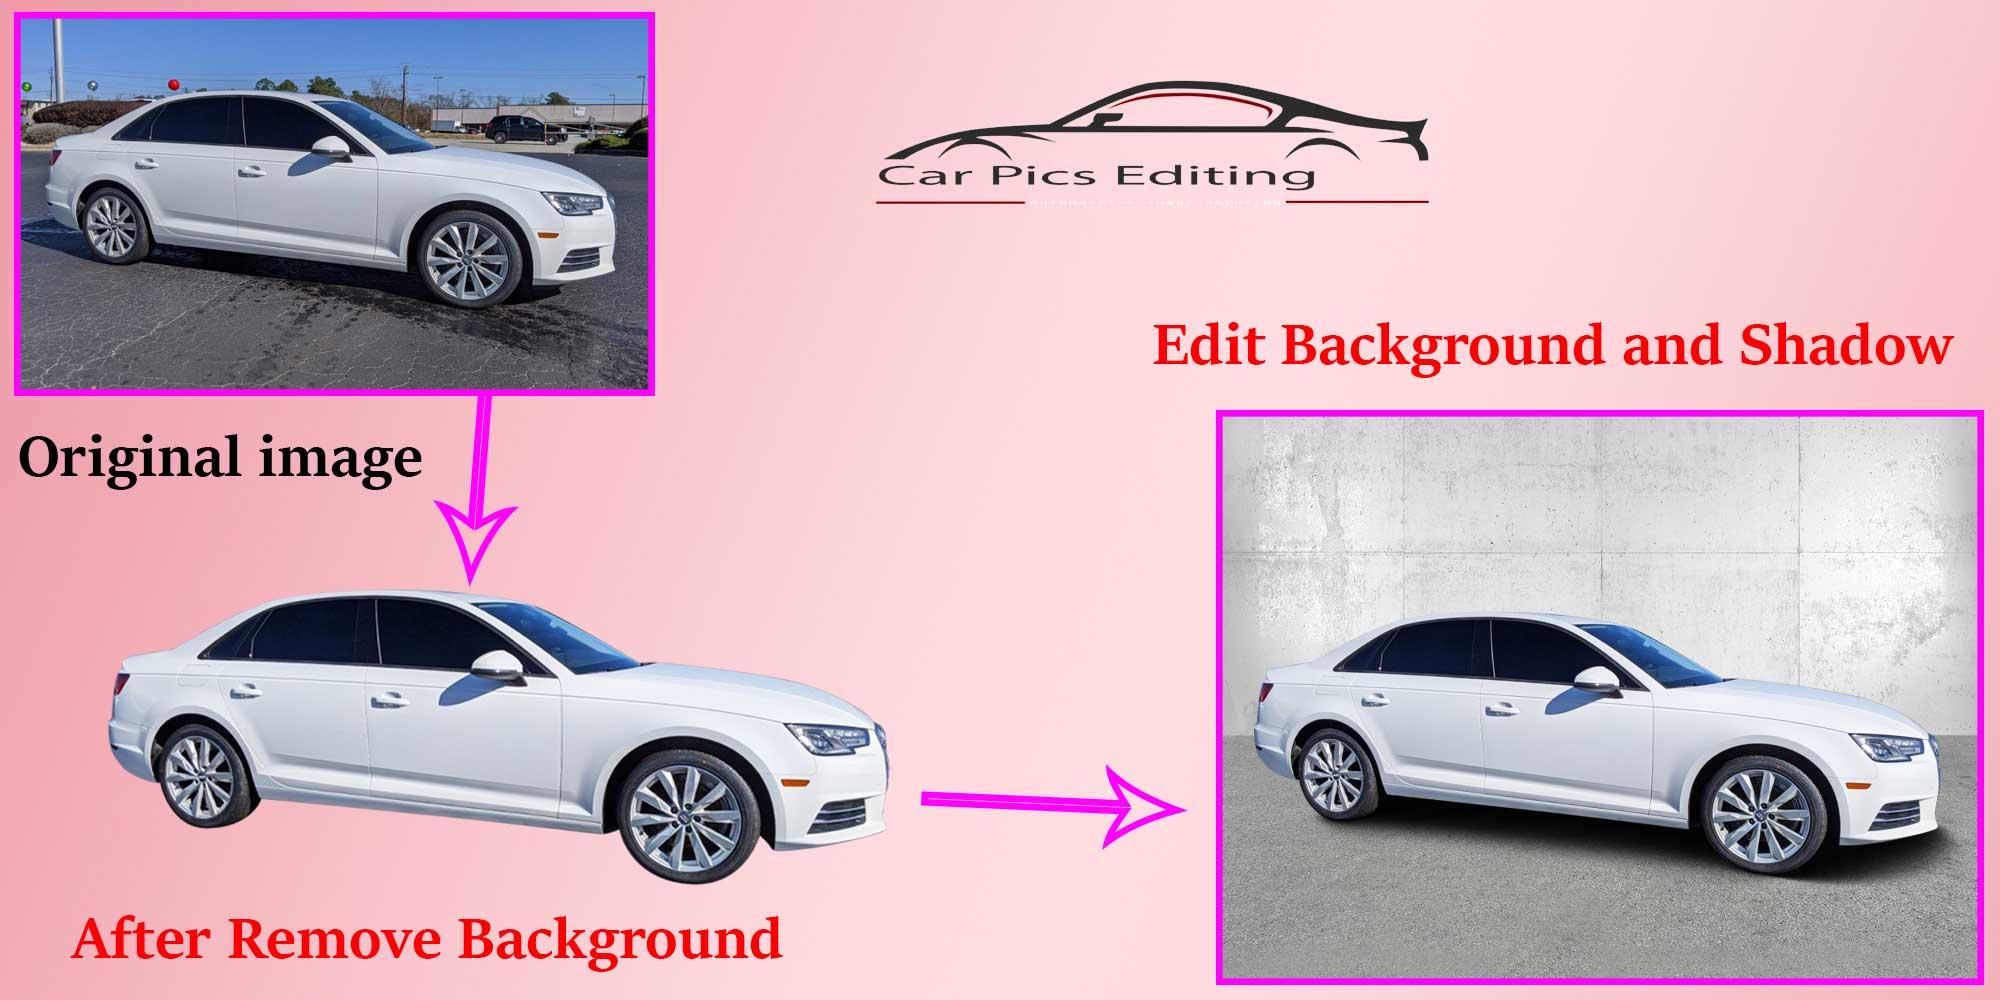 Car image editing process